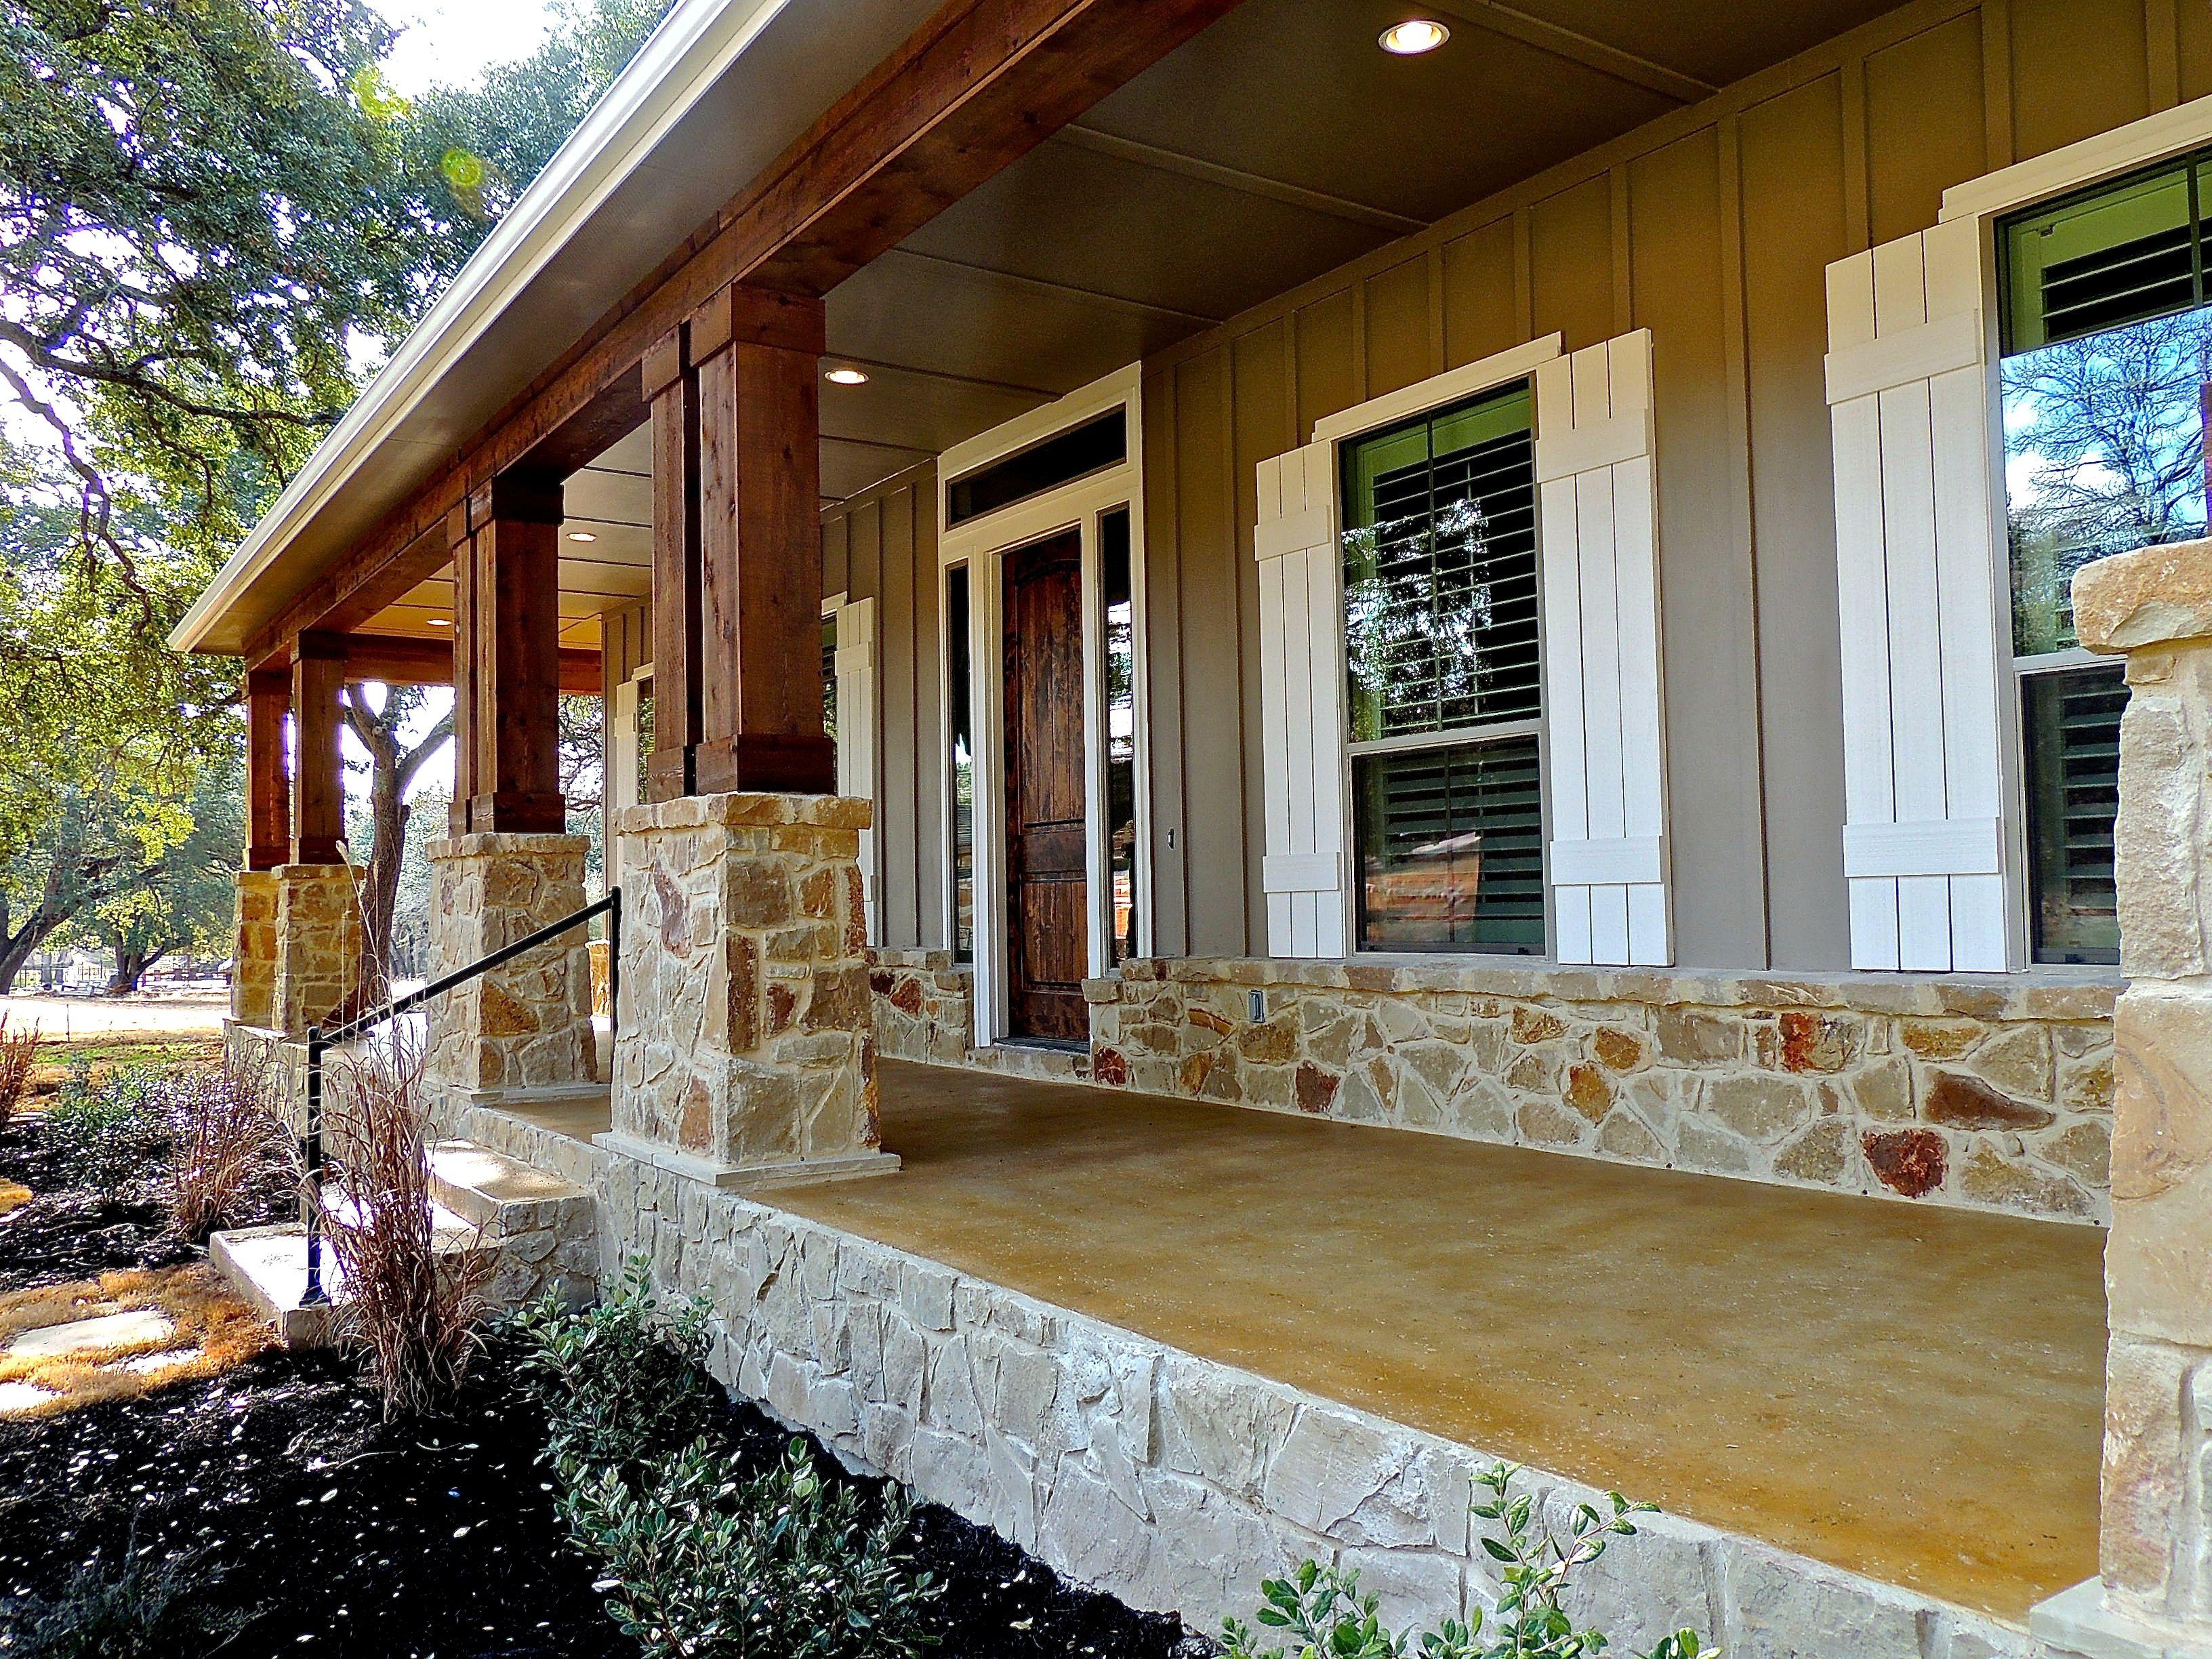 blogsview lane gordonville homes for bayou dove cabins tx cedar sale in texas search